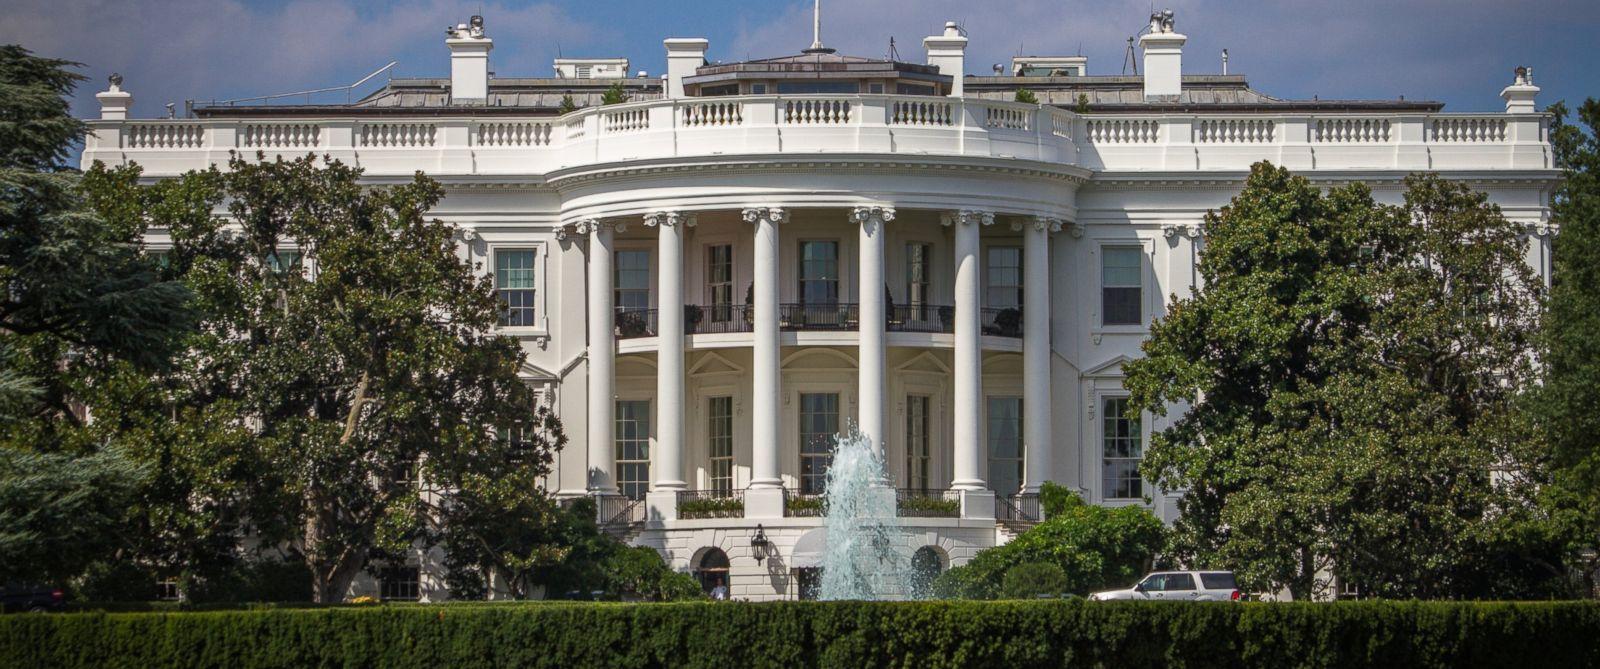 PHOTO: The White House in Washington, D.C.